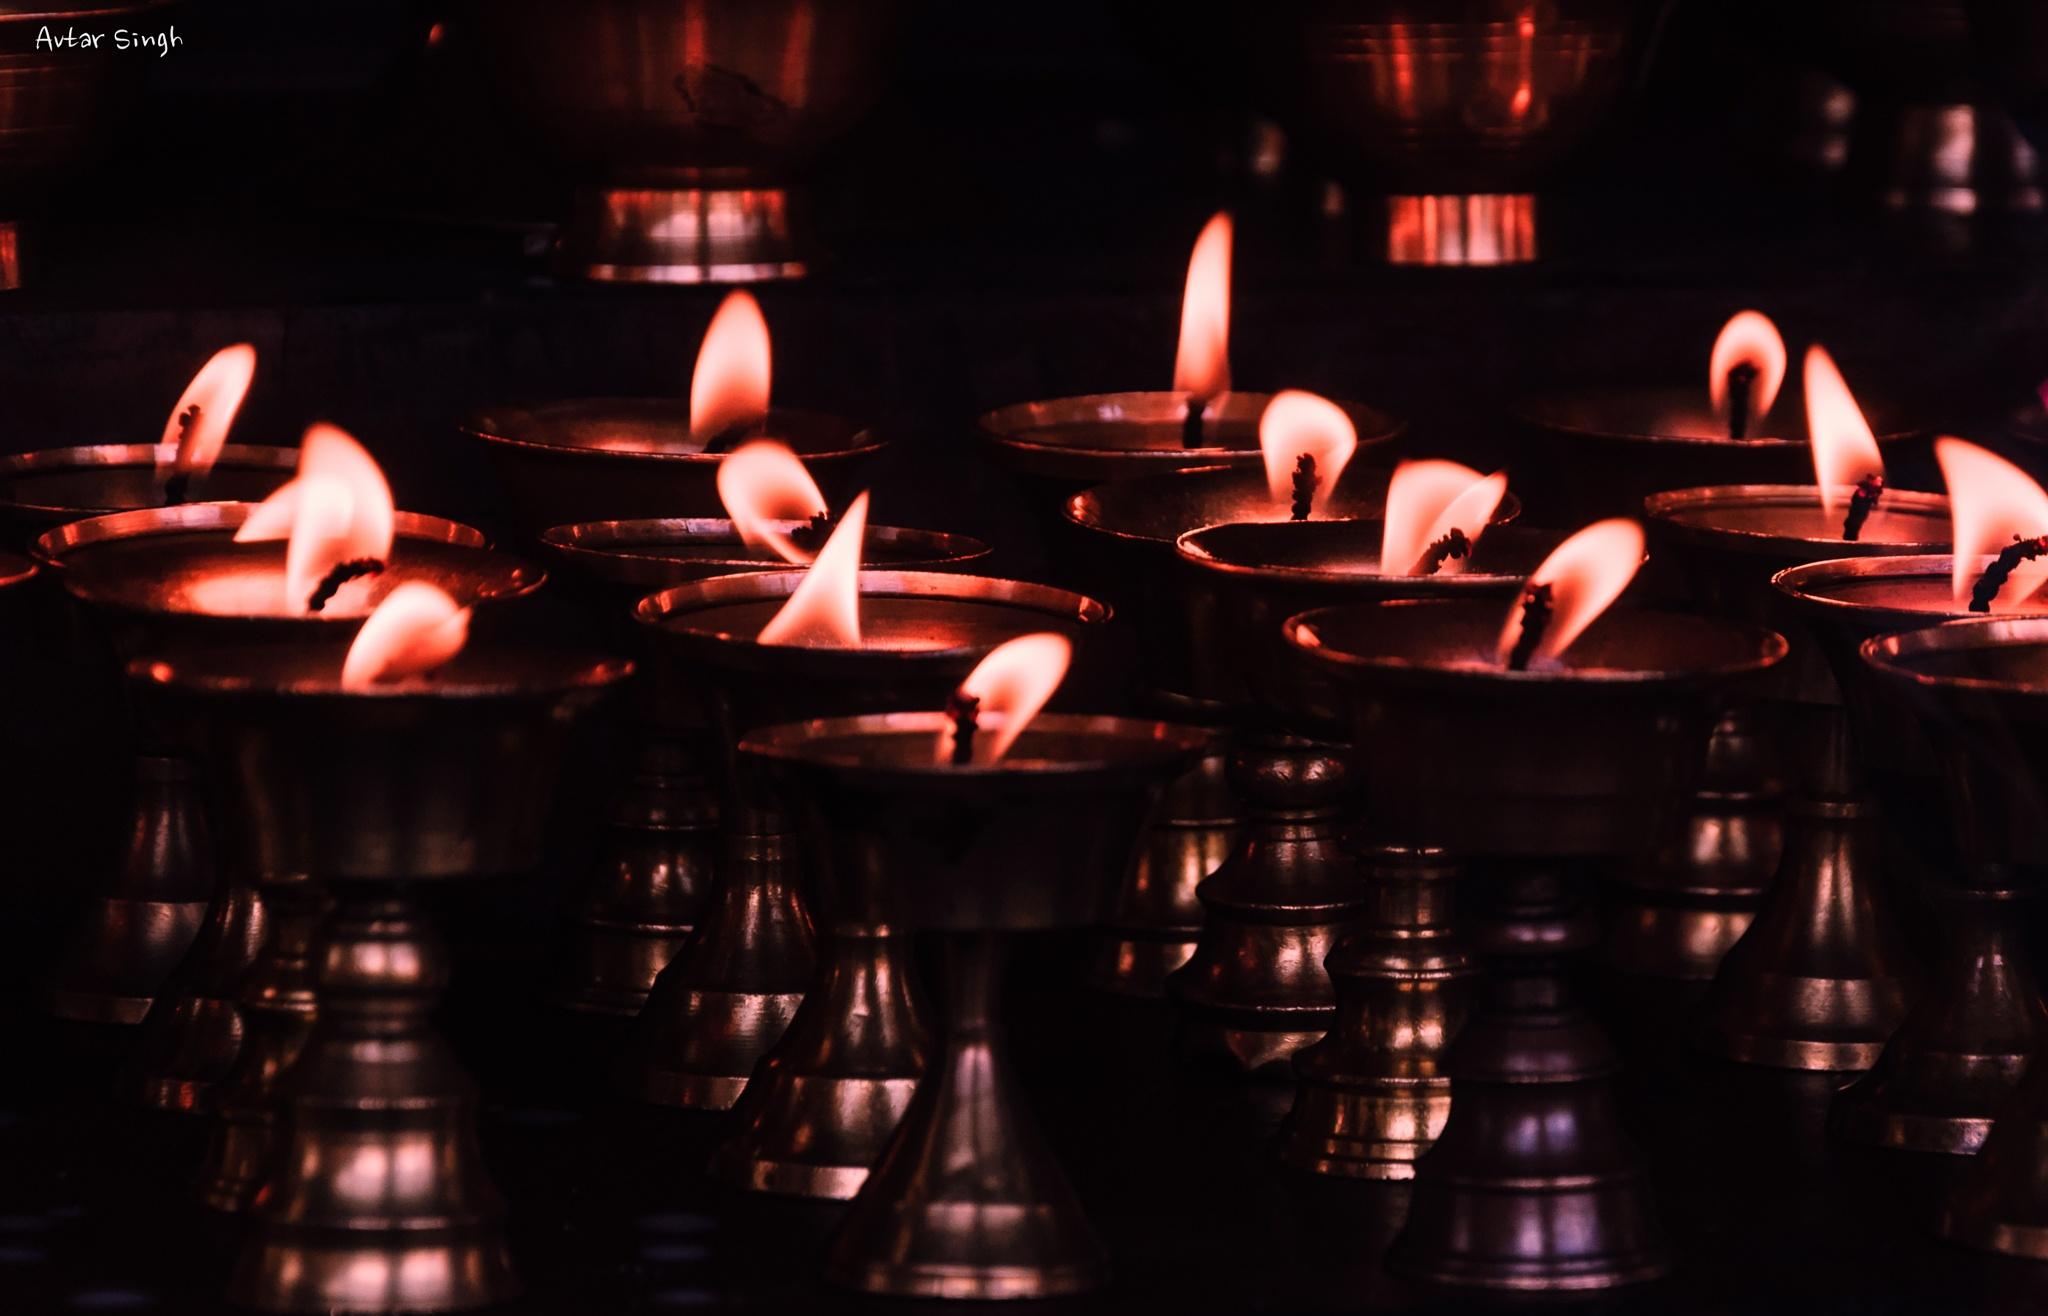 Oil lamps by Avtar Singh